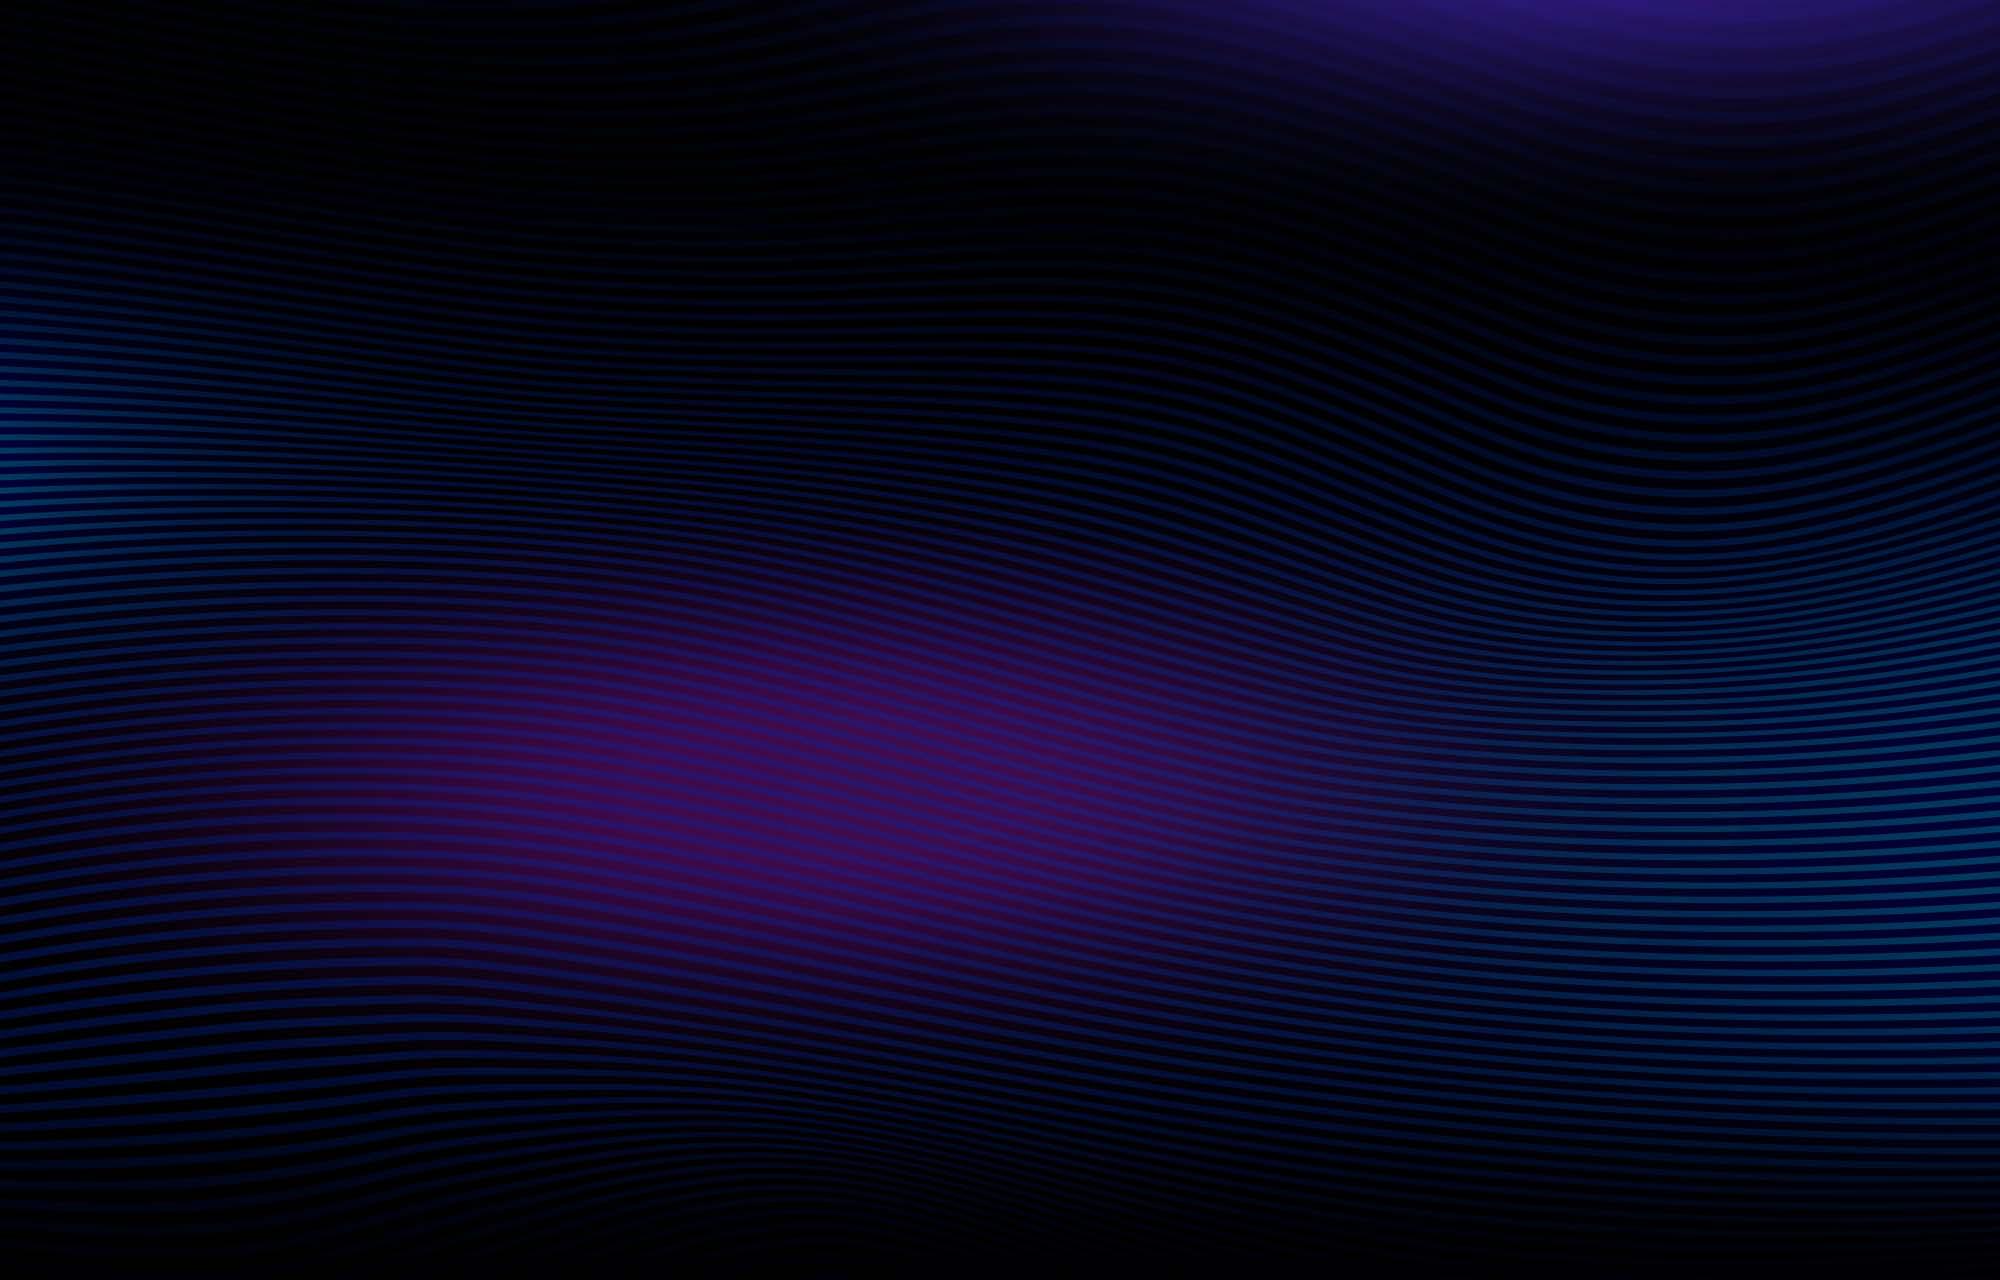 background_video-2000x1280